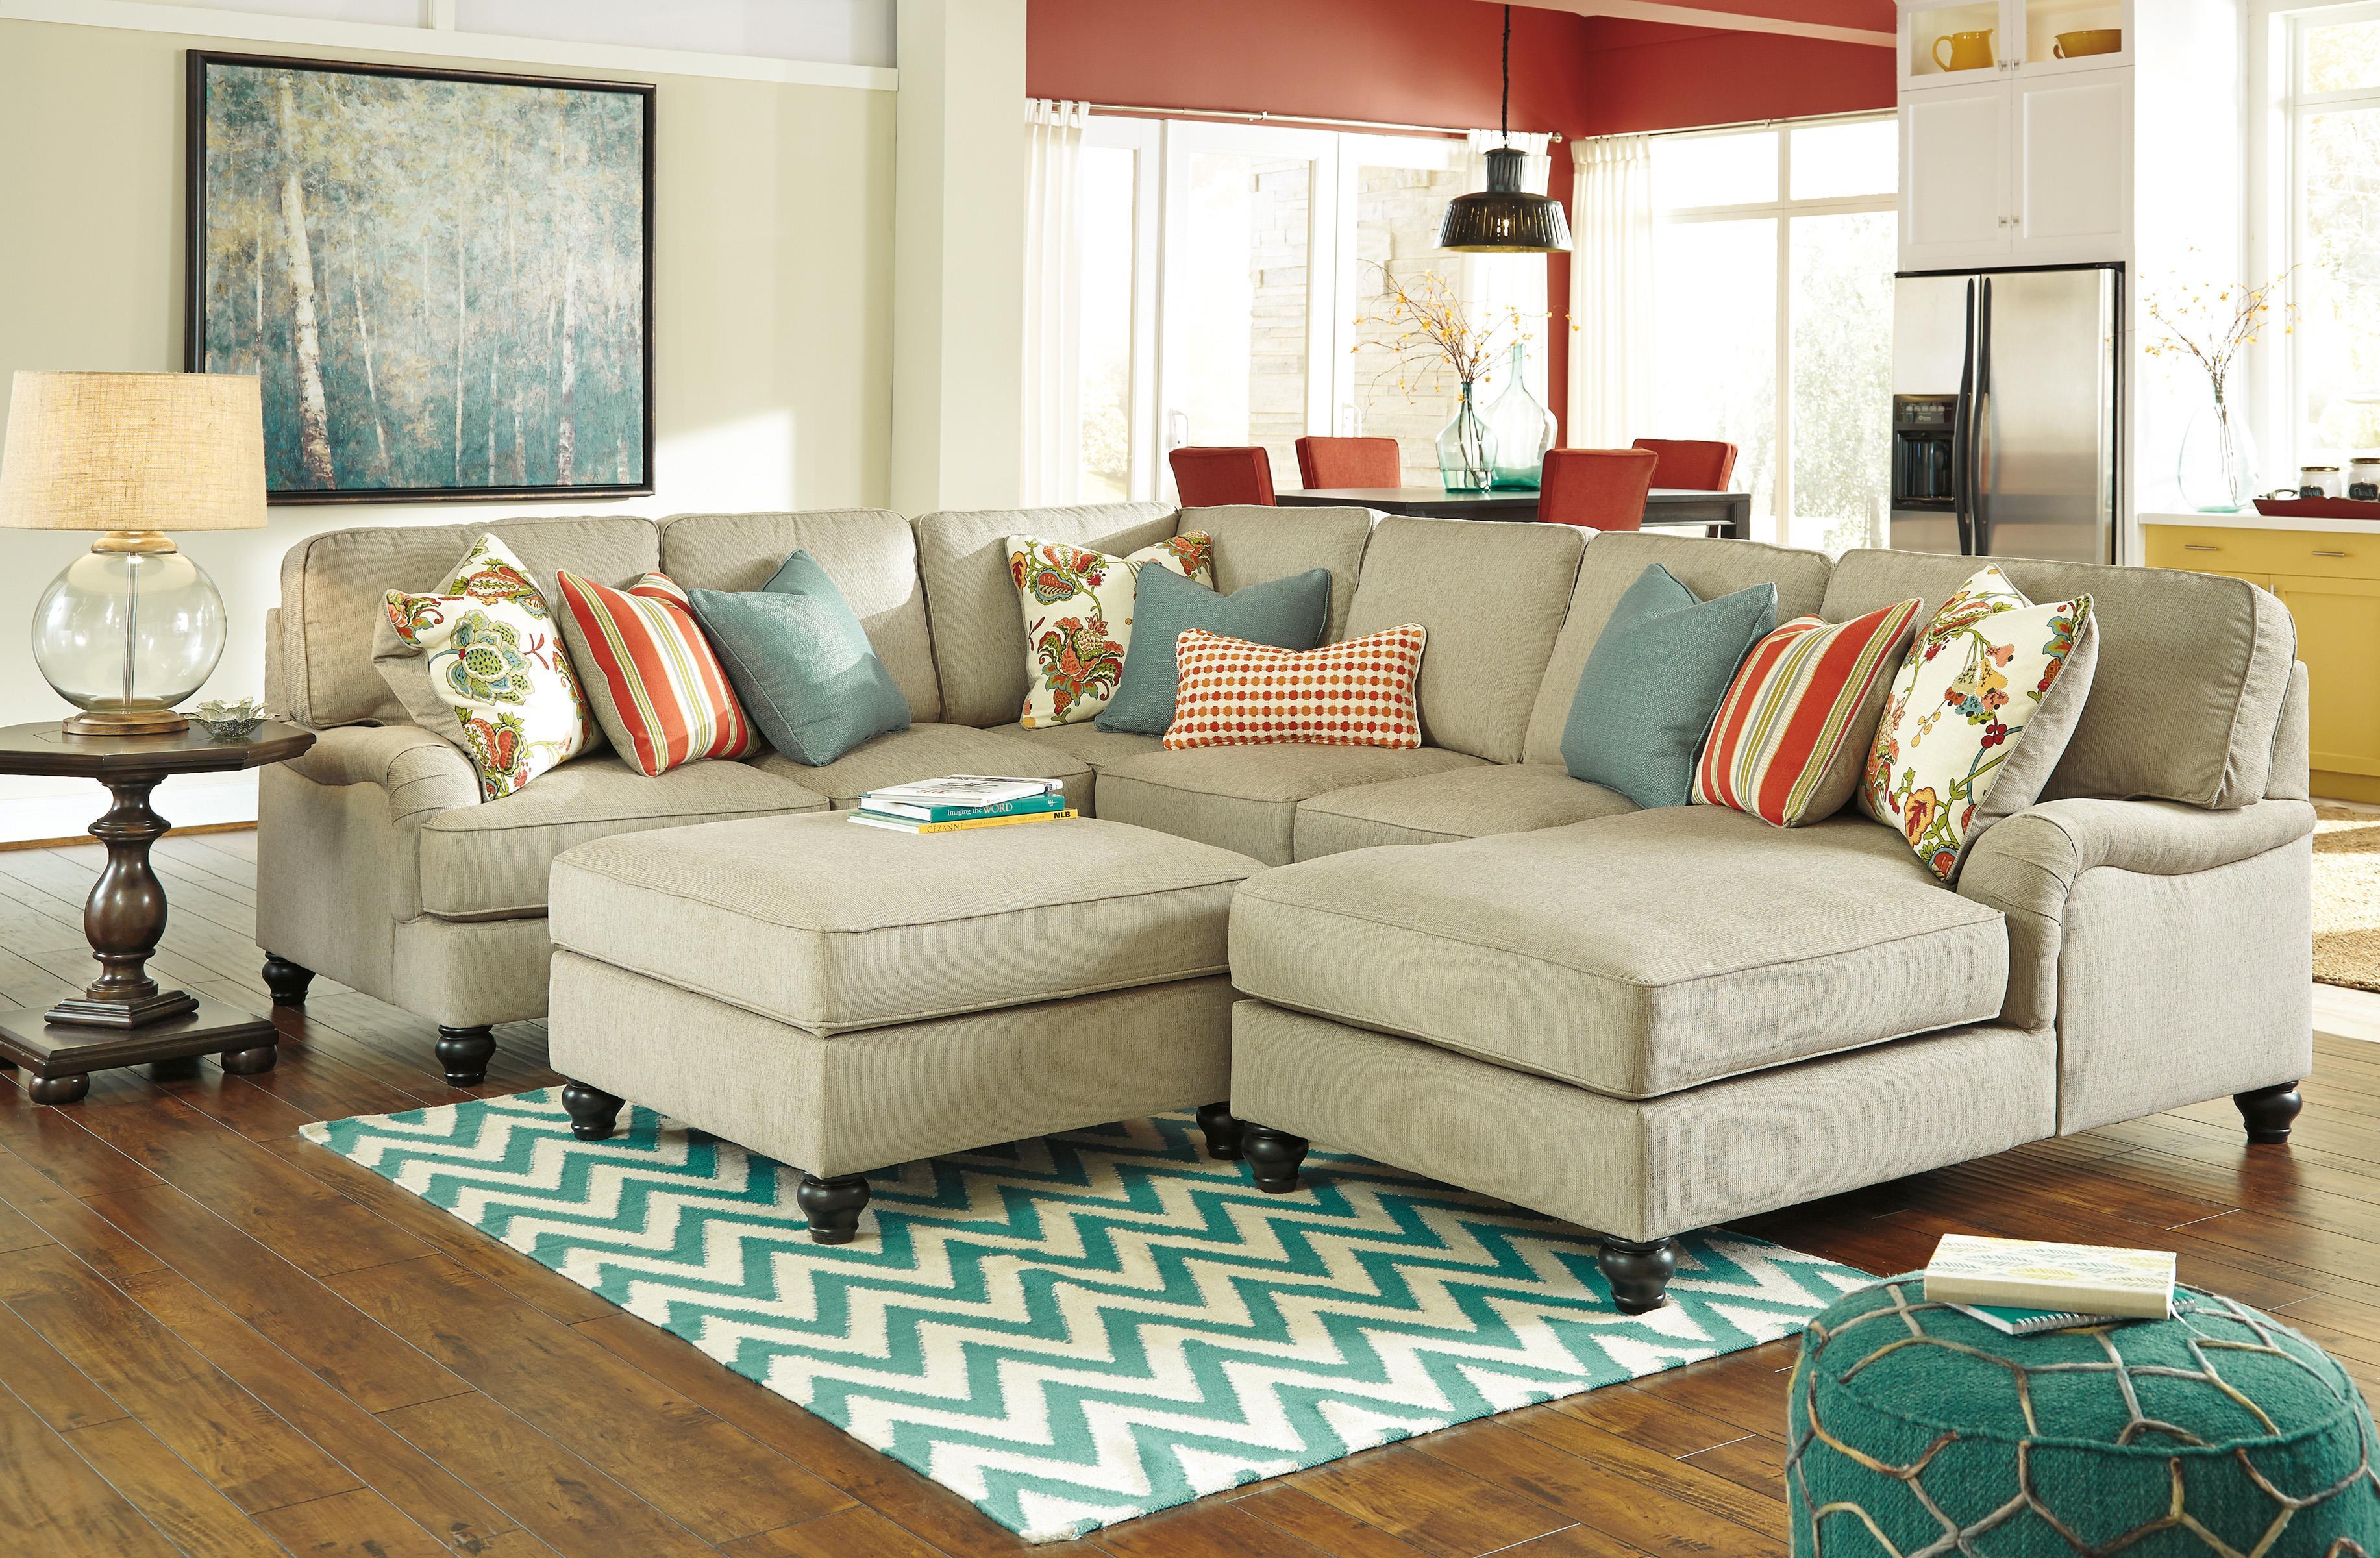 Ashley/Benchcraft Kerridon Stationary Living Room Group - Item Number: 26300 Living Room Group 6